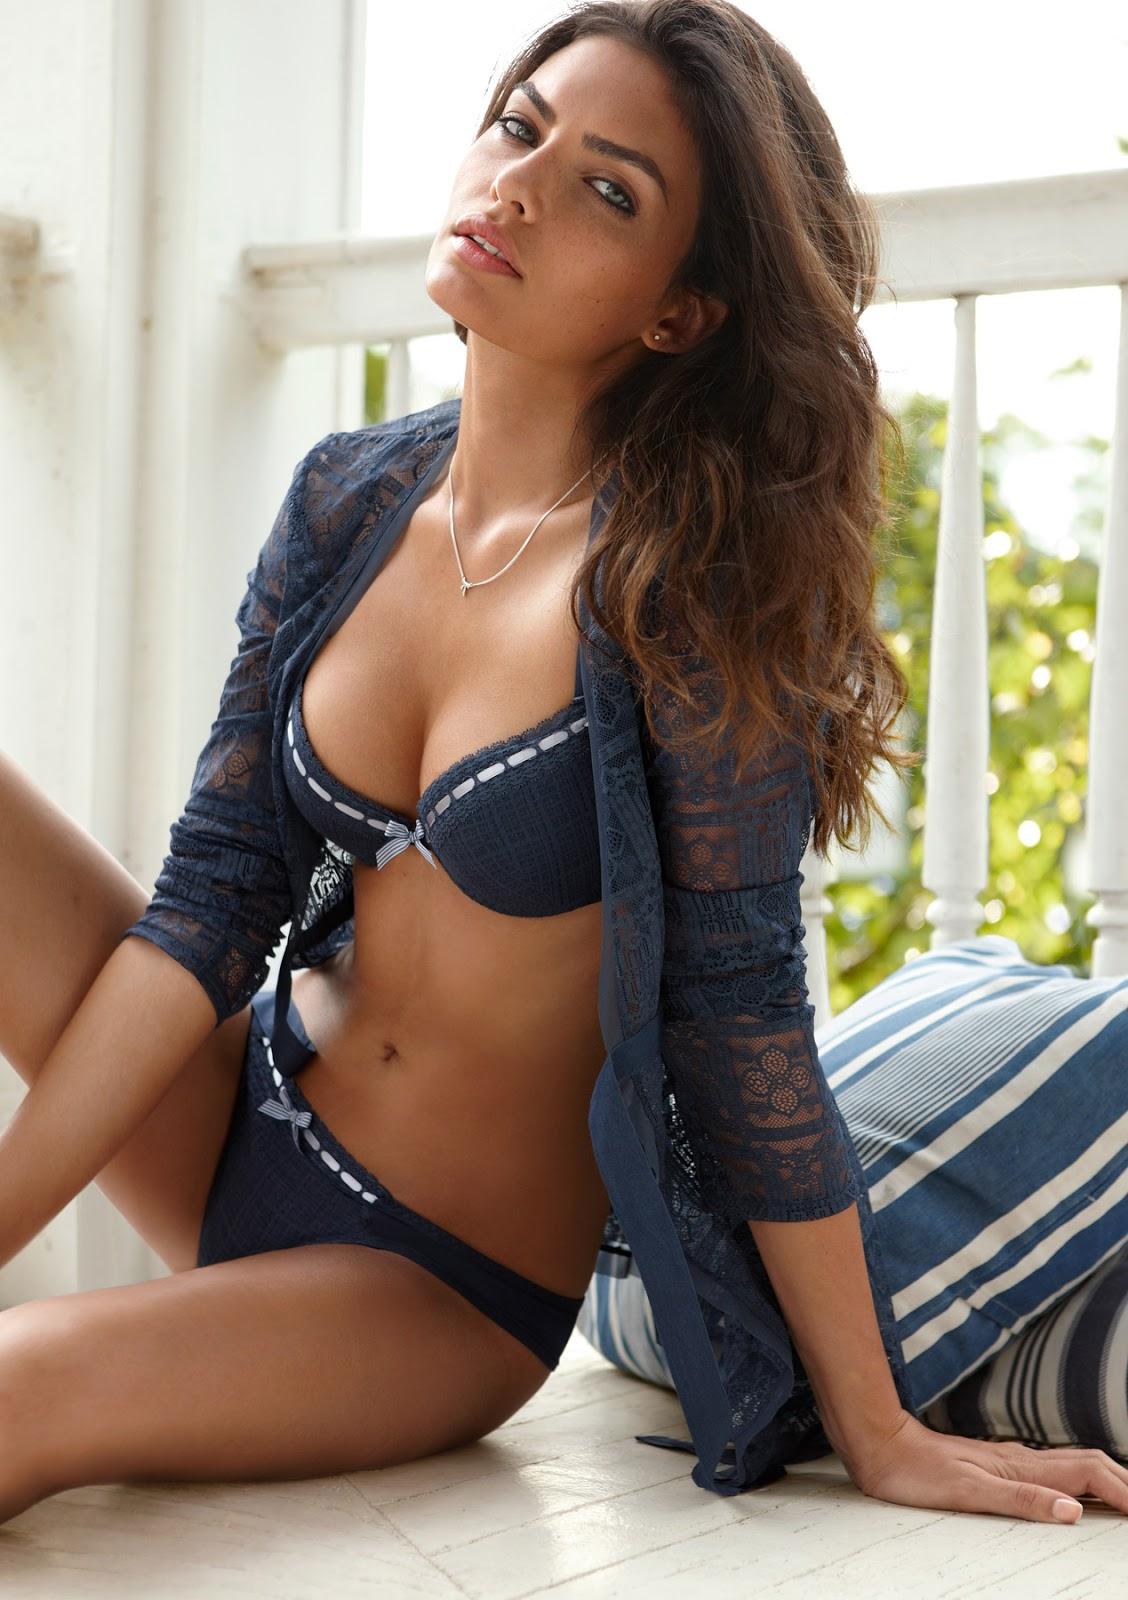 Alyssa Modelo No Desnuda